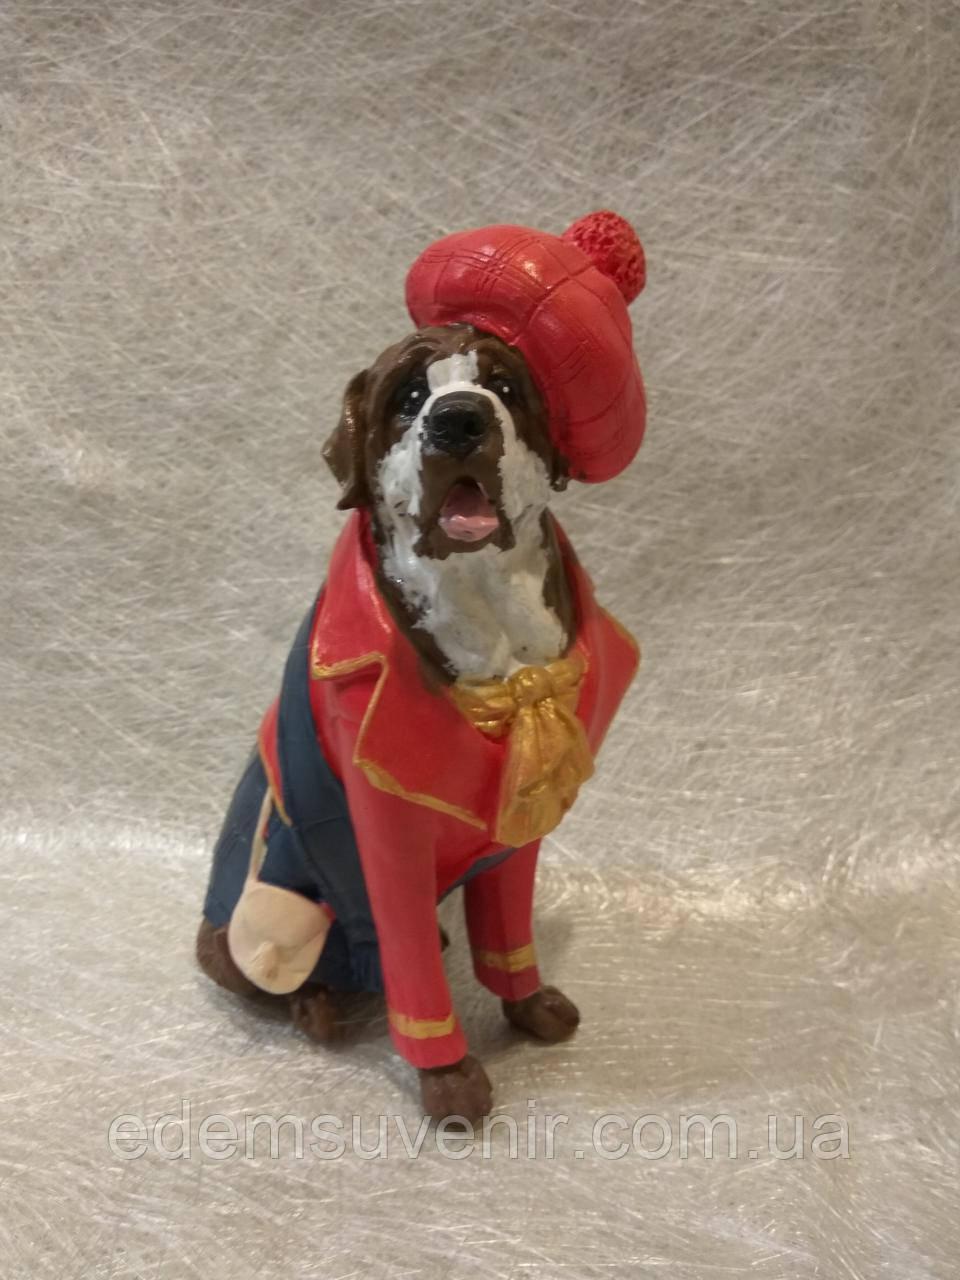 Статуэтка собака сенбернар